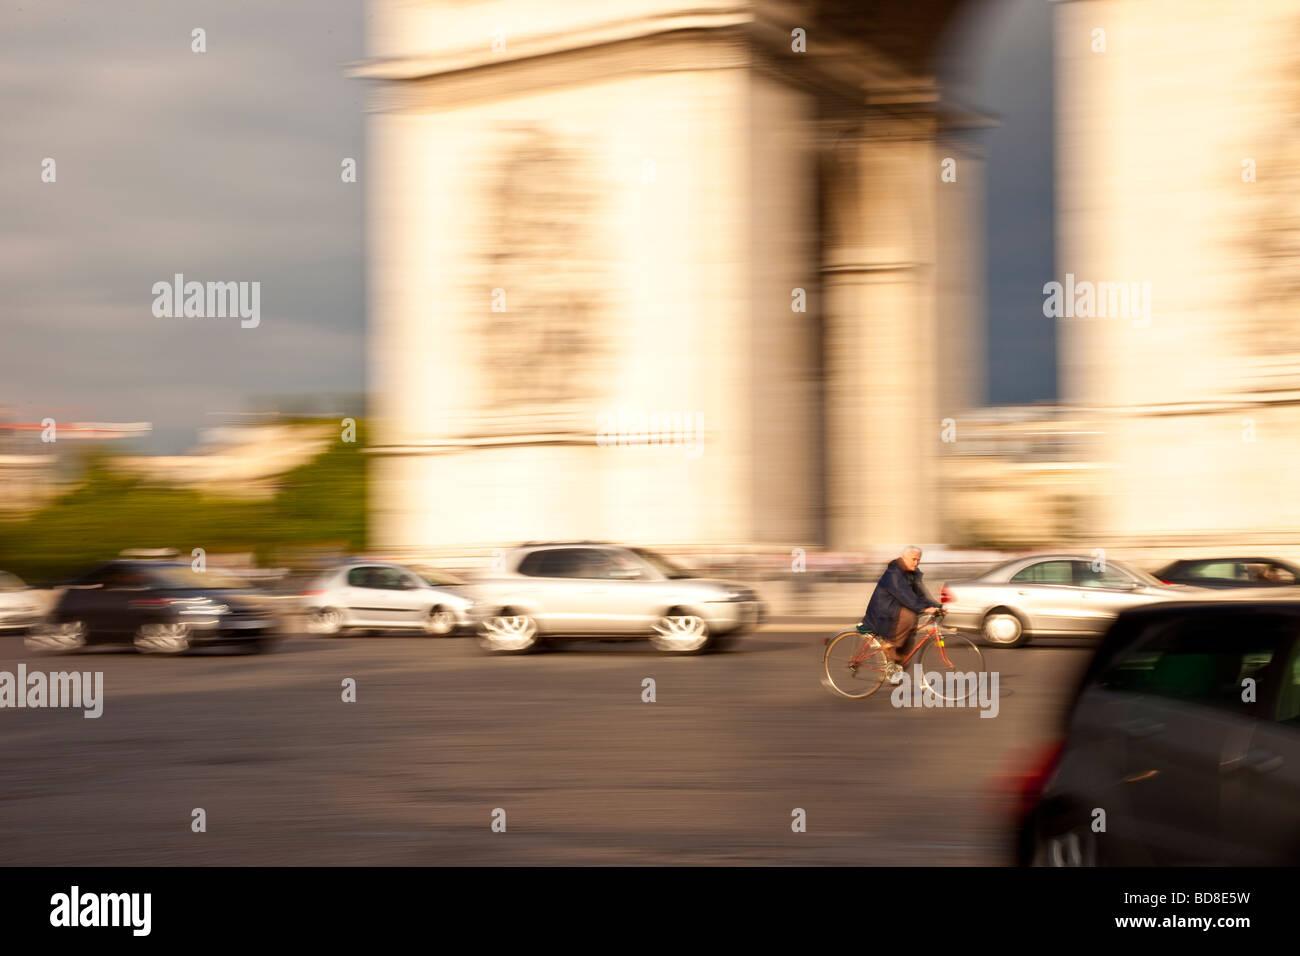 Brave bicycle rider at Arc de Triomphe, Paris France - Stock Image